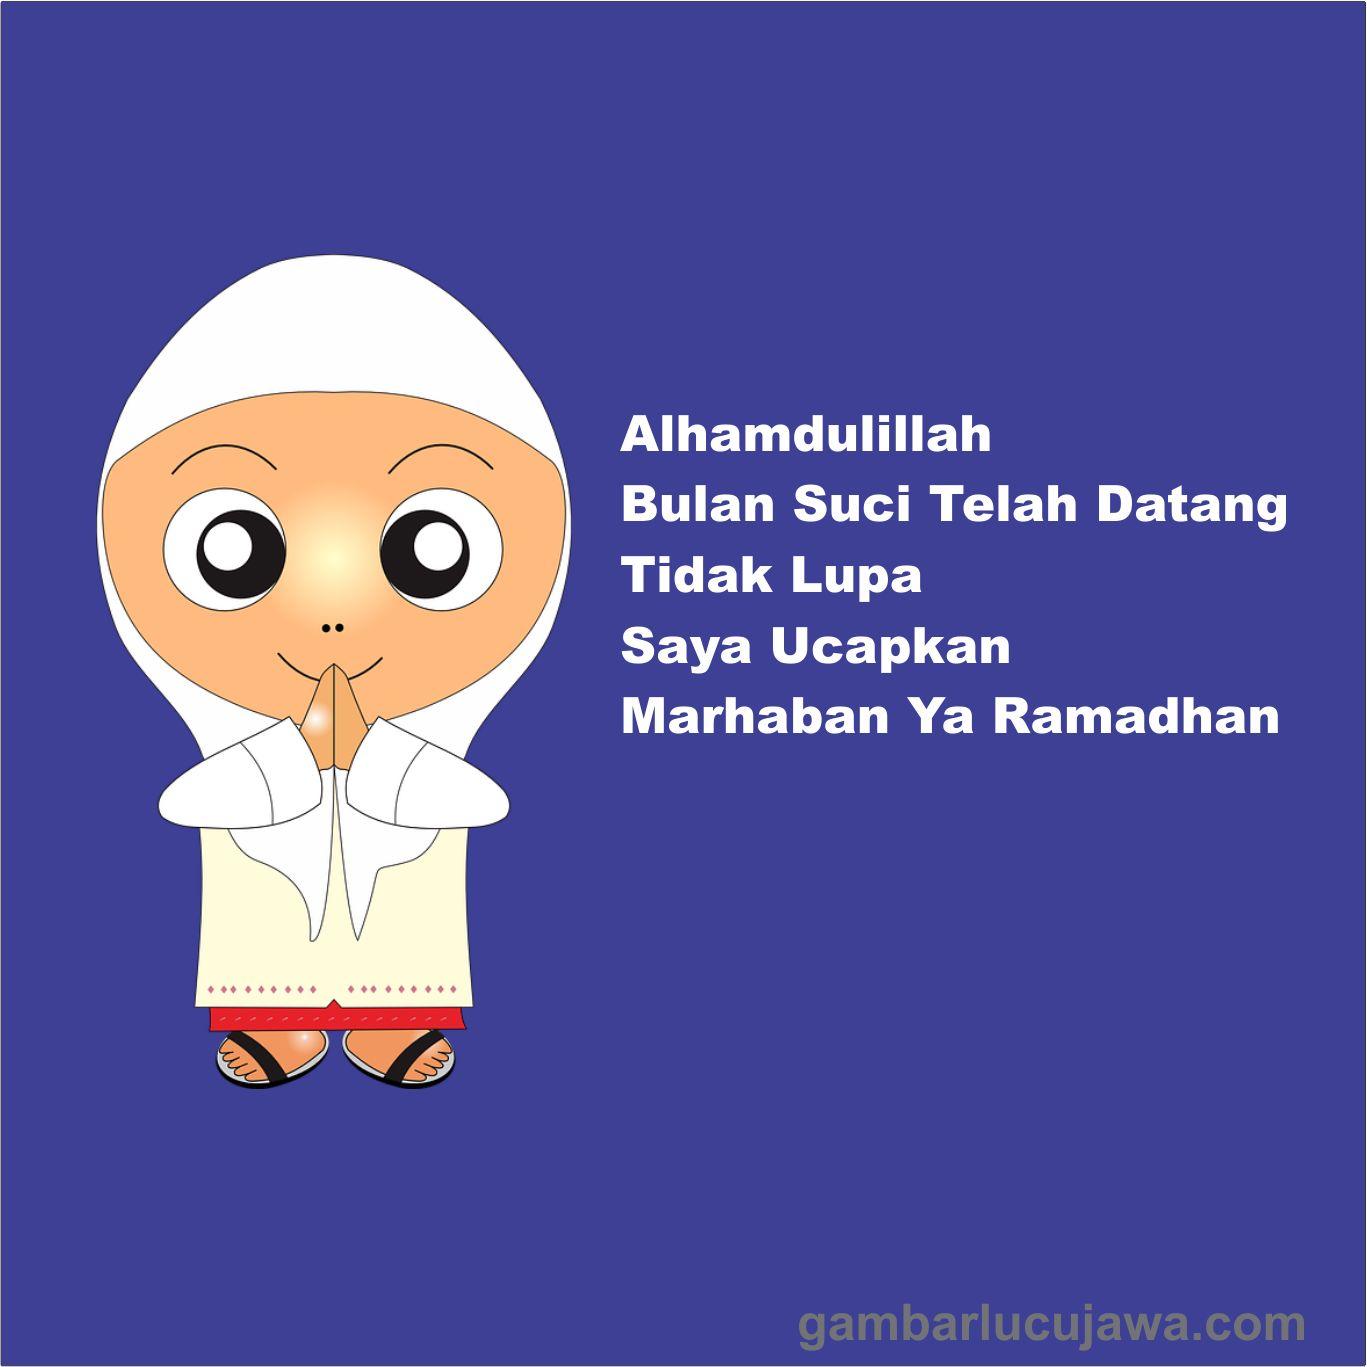 Koleksi Dp Bbm Bulan Ramadhan Yg Lucu Kocak Dan Gokil Puzzle